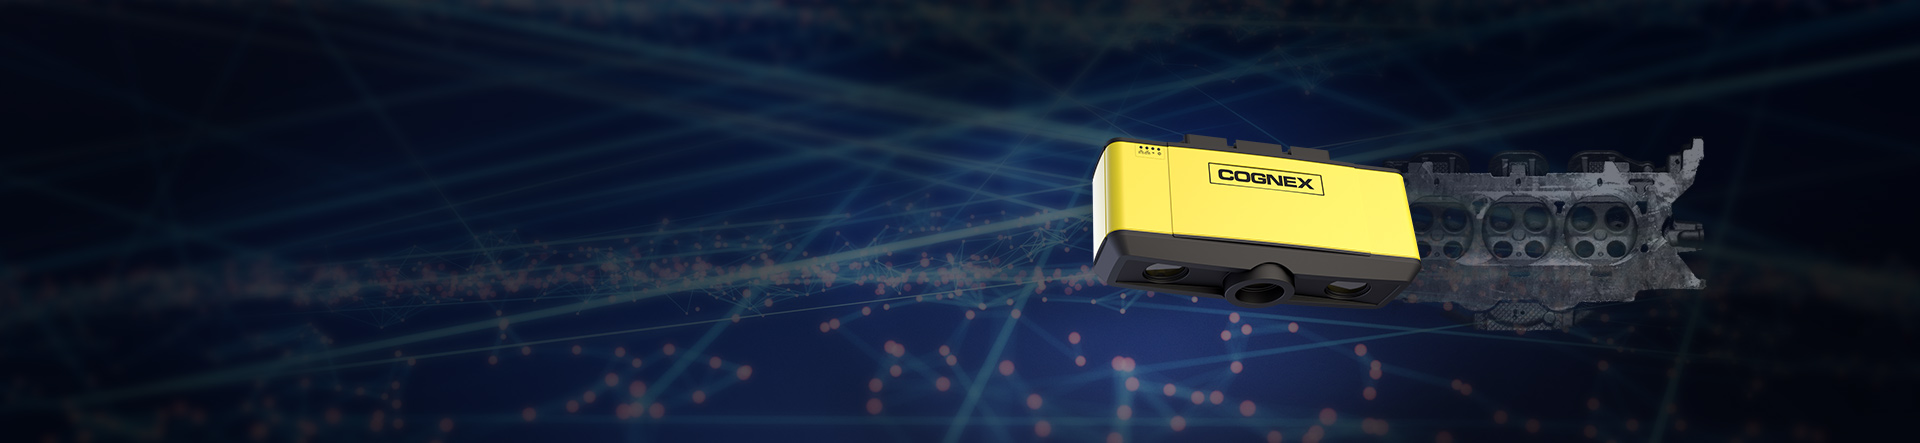 3D Area Scan Cameras